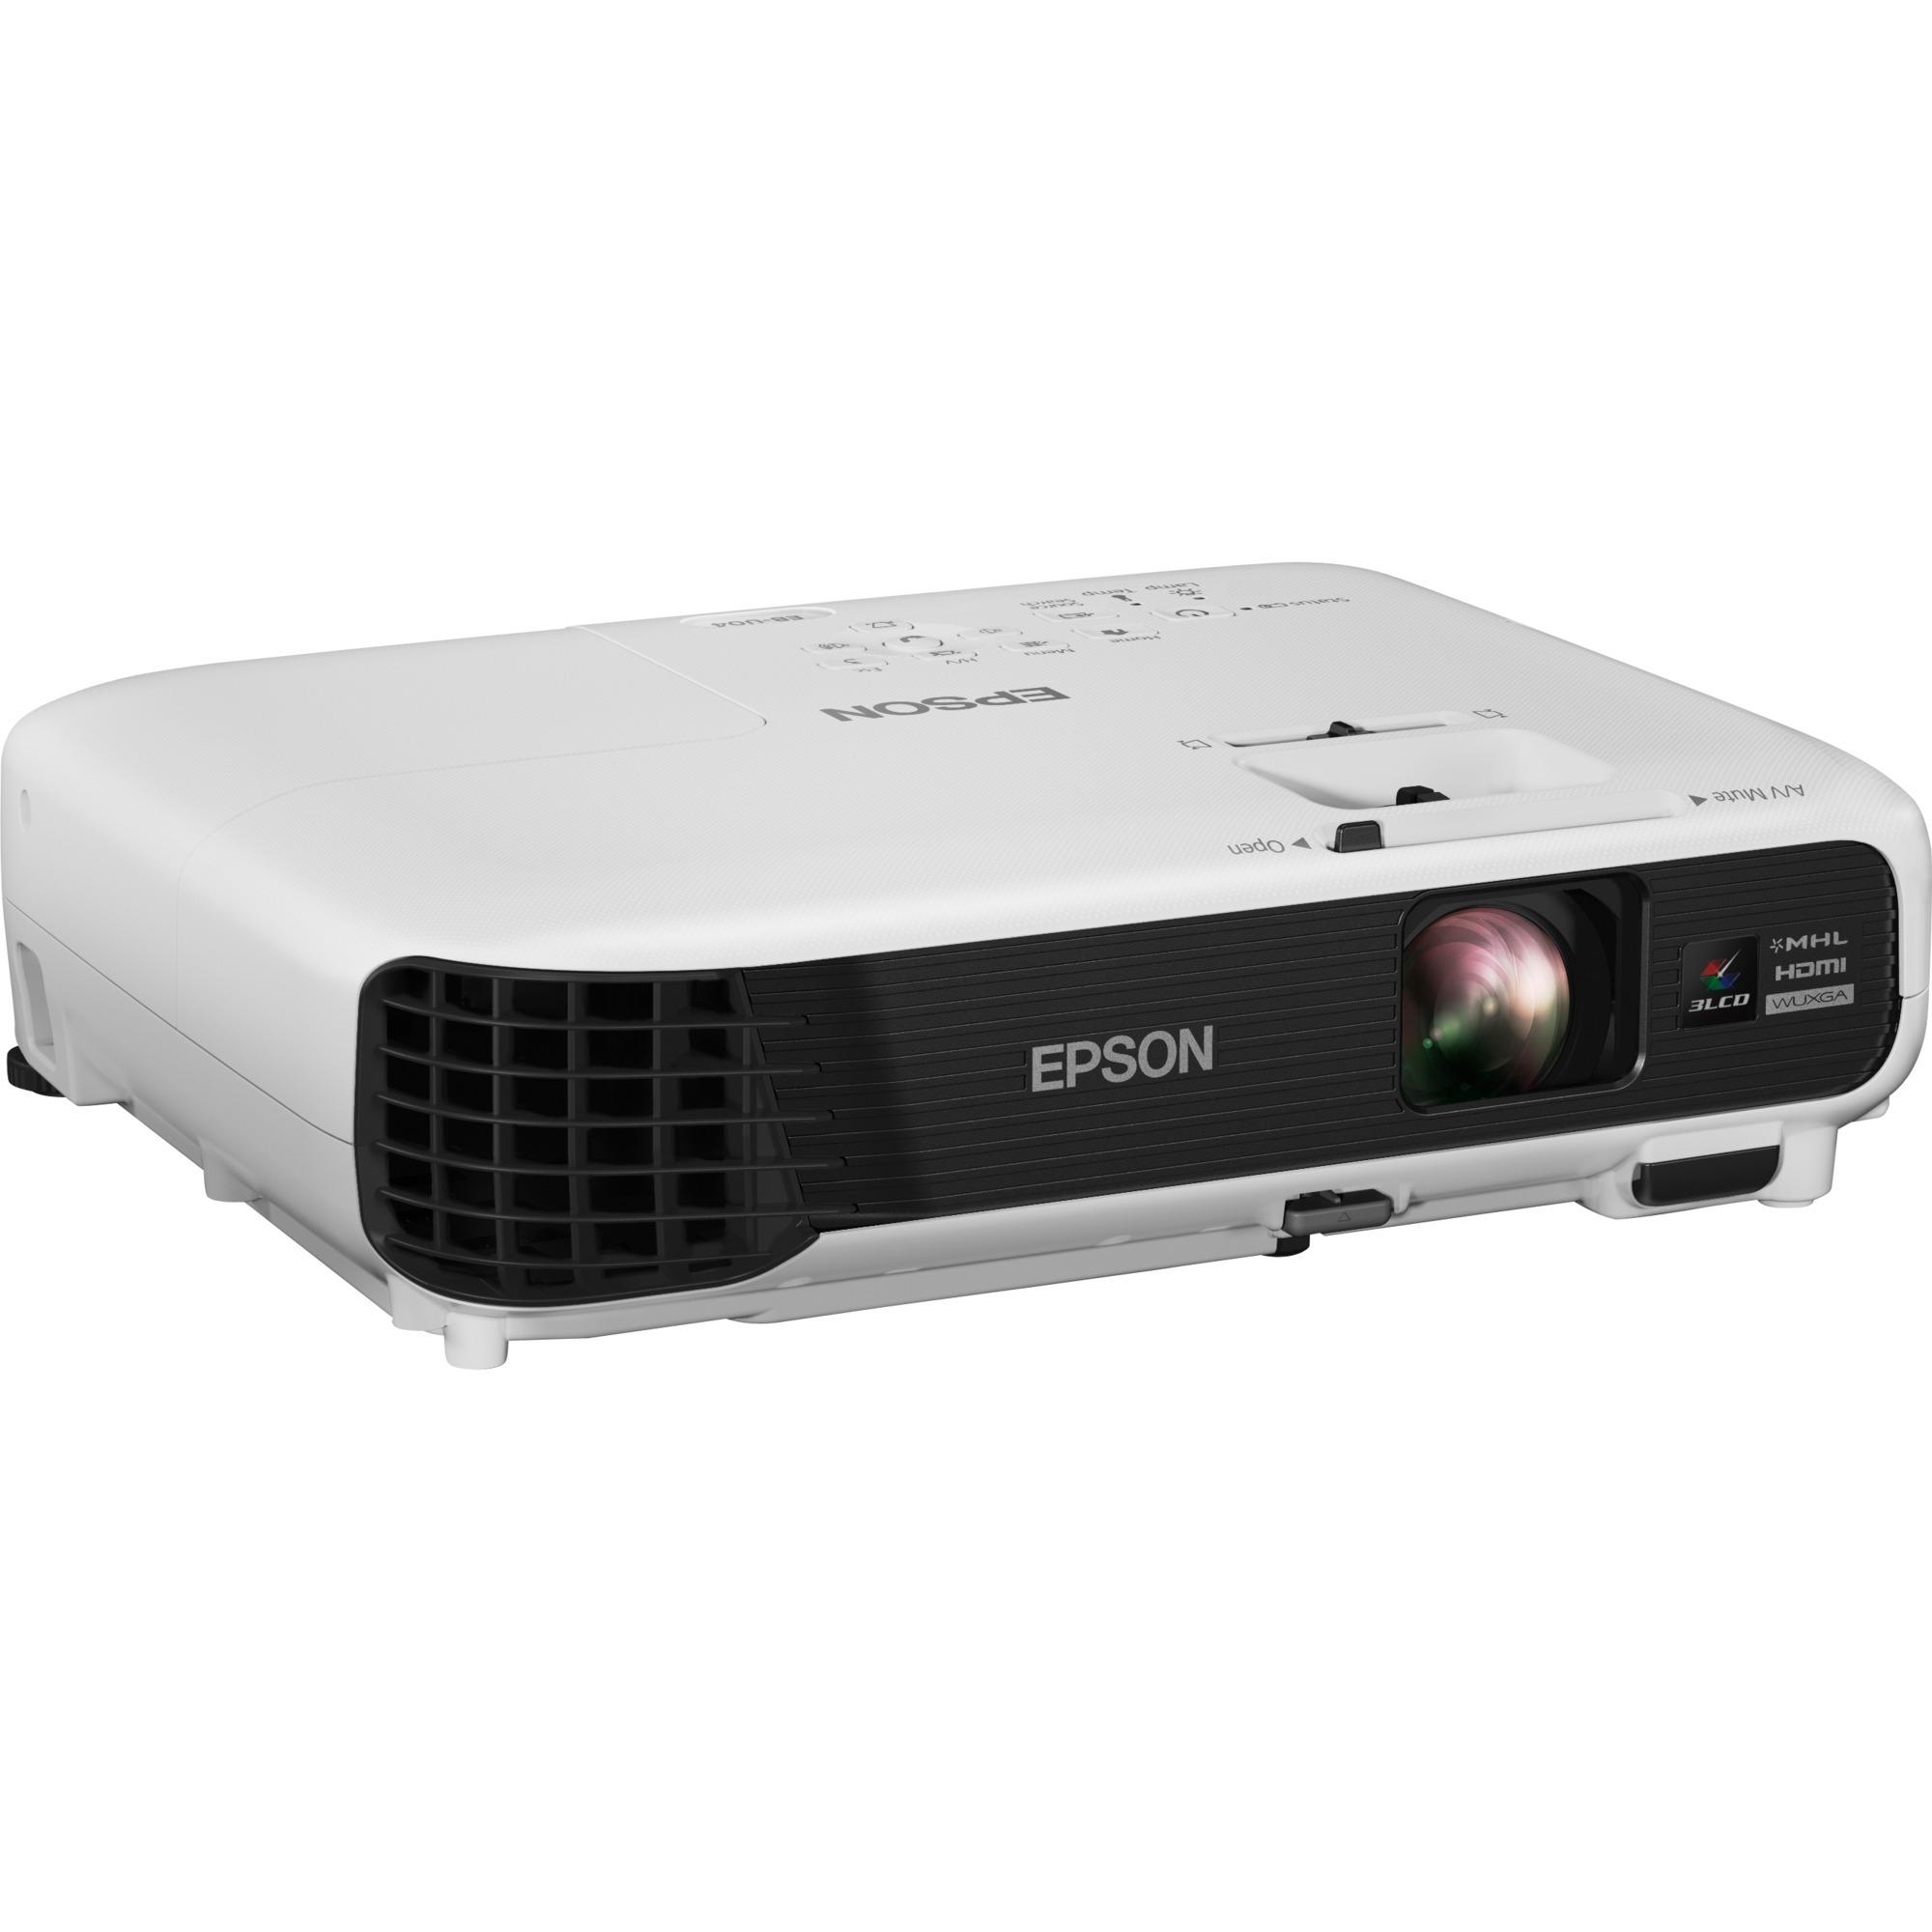 EB-U04 Vidéoprojecteur portable 3000ANSI lumens 3LCD WUXGA (1920x1200) Blanc vidéo-projecteur, Projecteur LCD